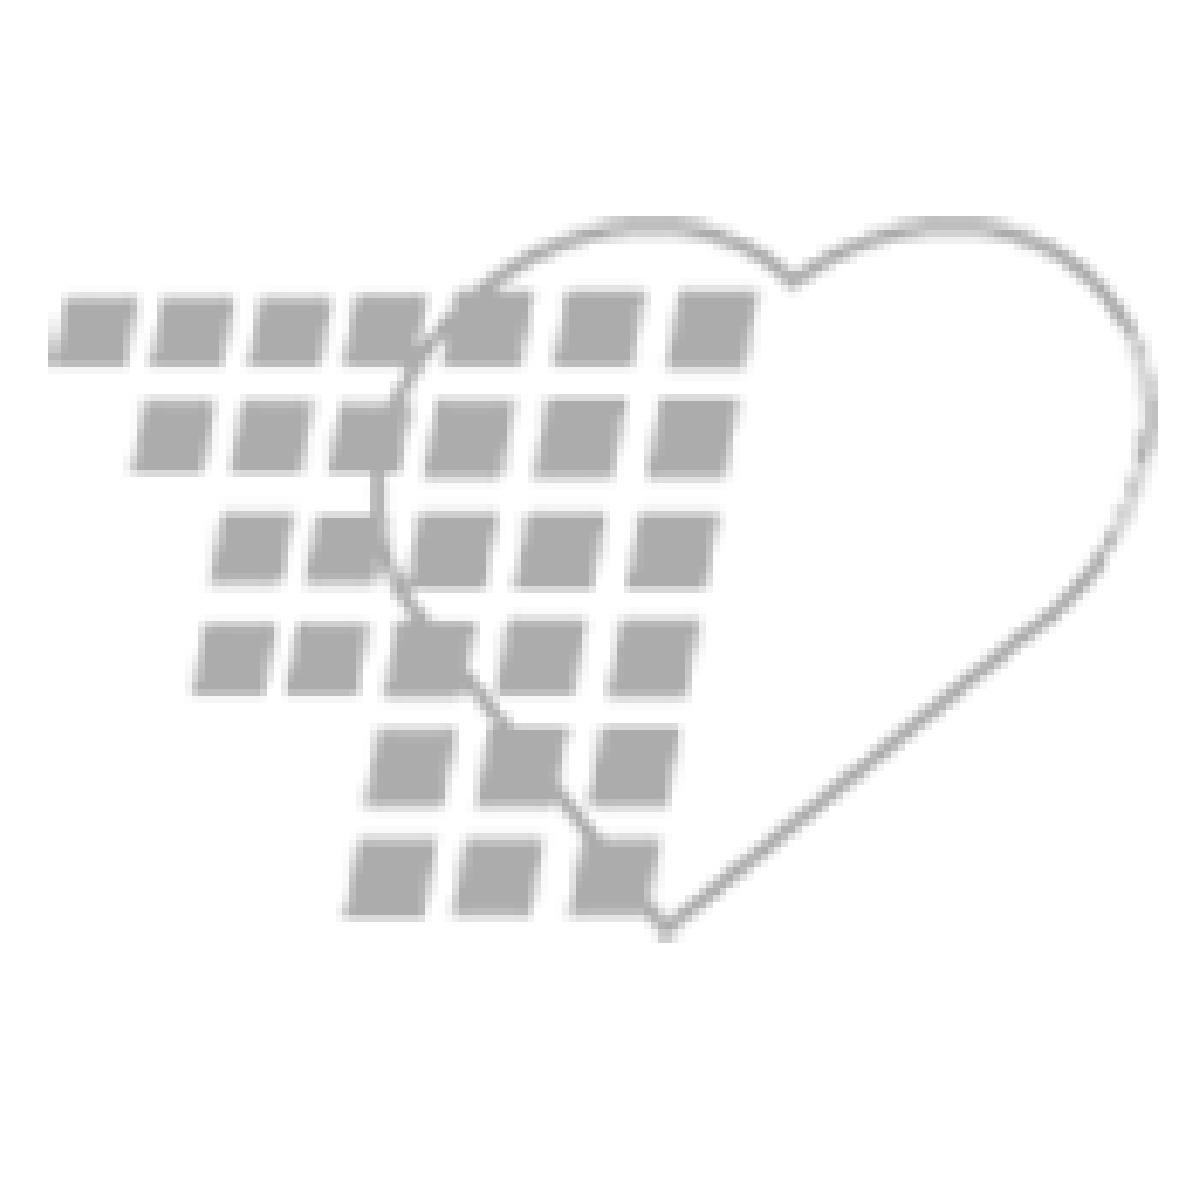 04-25-0691 - Medical Cart Plastic Lockout Seals